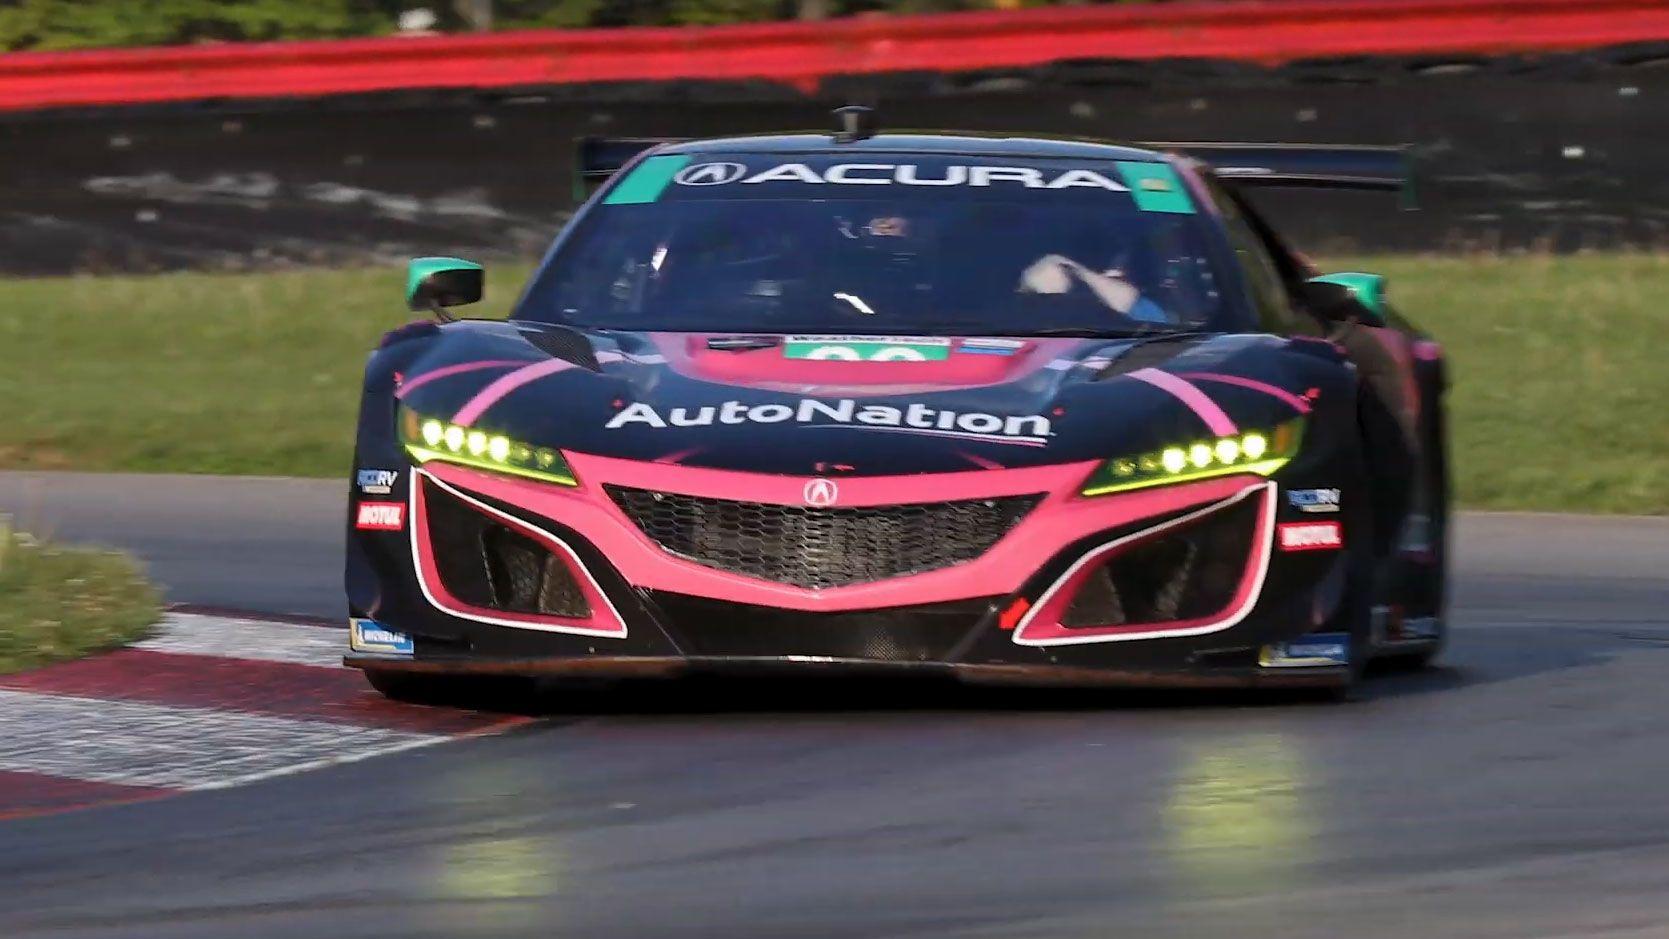 Nsx Versus Nsx Gt3 Evo Watch Acura Stage A Road Car Race Car Throwdown